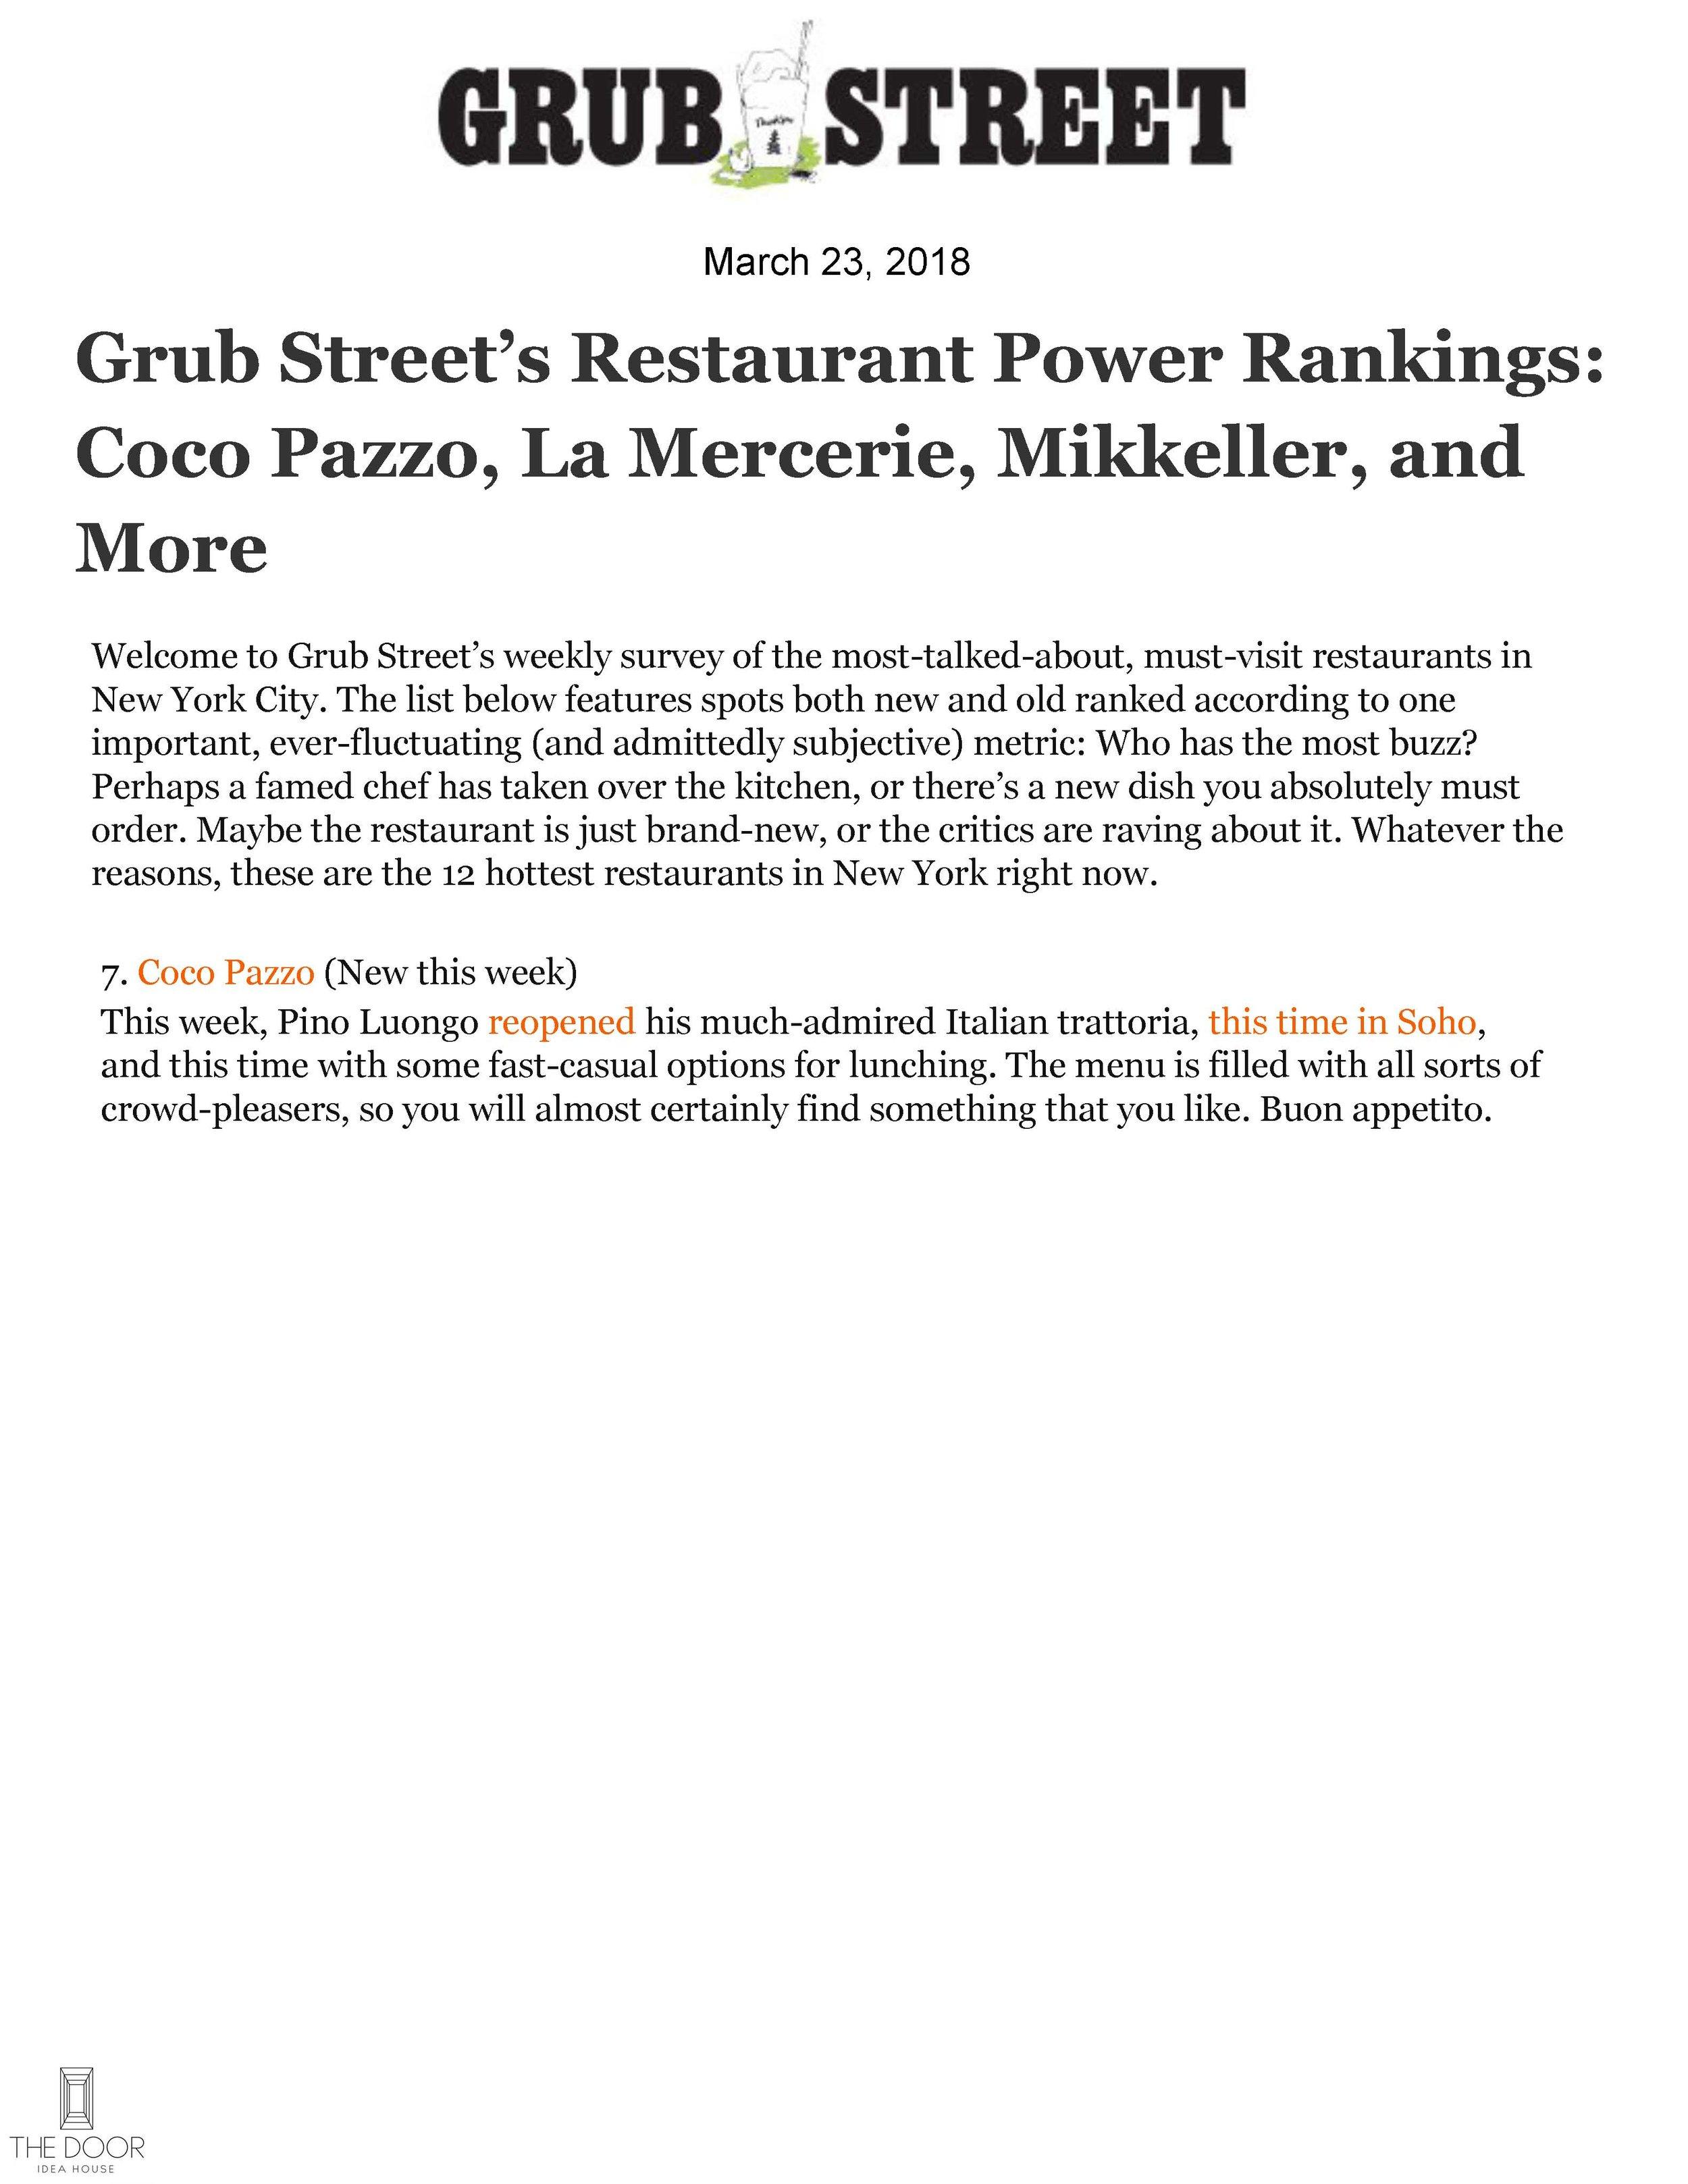 GrubStreet_CP_3_23.jpg